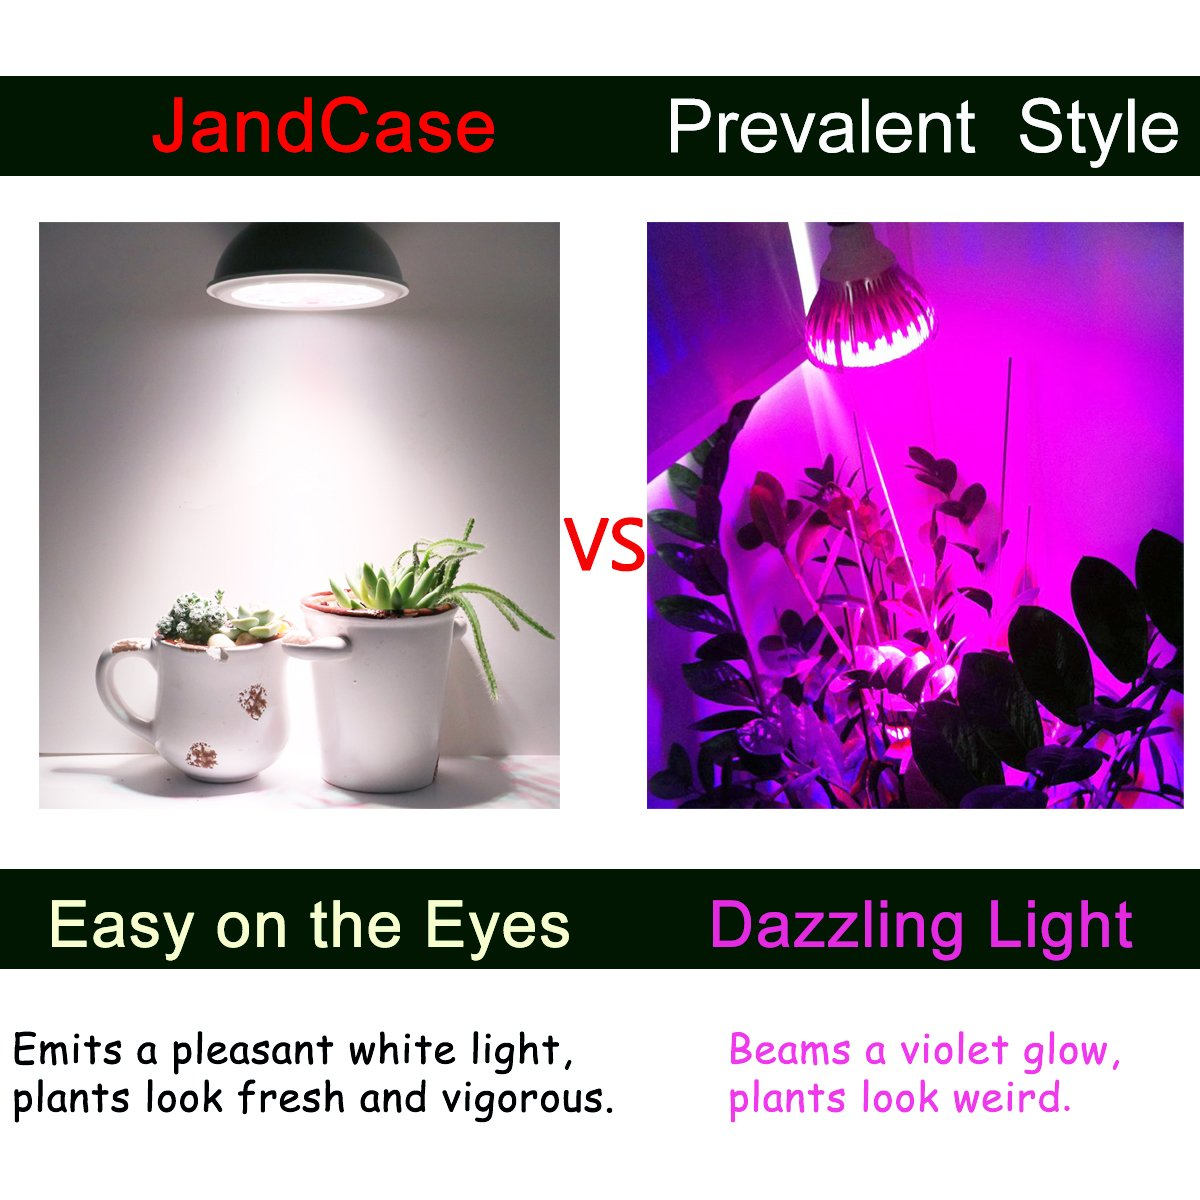 Jandcase Full Spectrum White Light Led Grow Light Bulb 20w Natural Plant Light For Greenhouse Gardening Grow Bulb For Indoor Hydroponic Plants E26